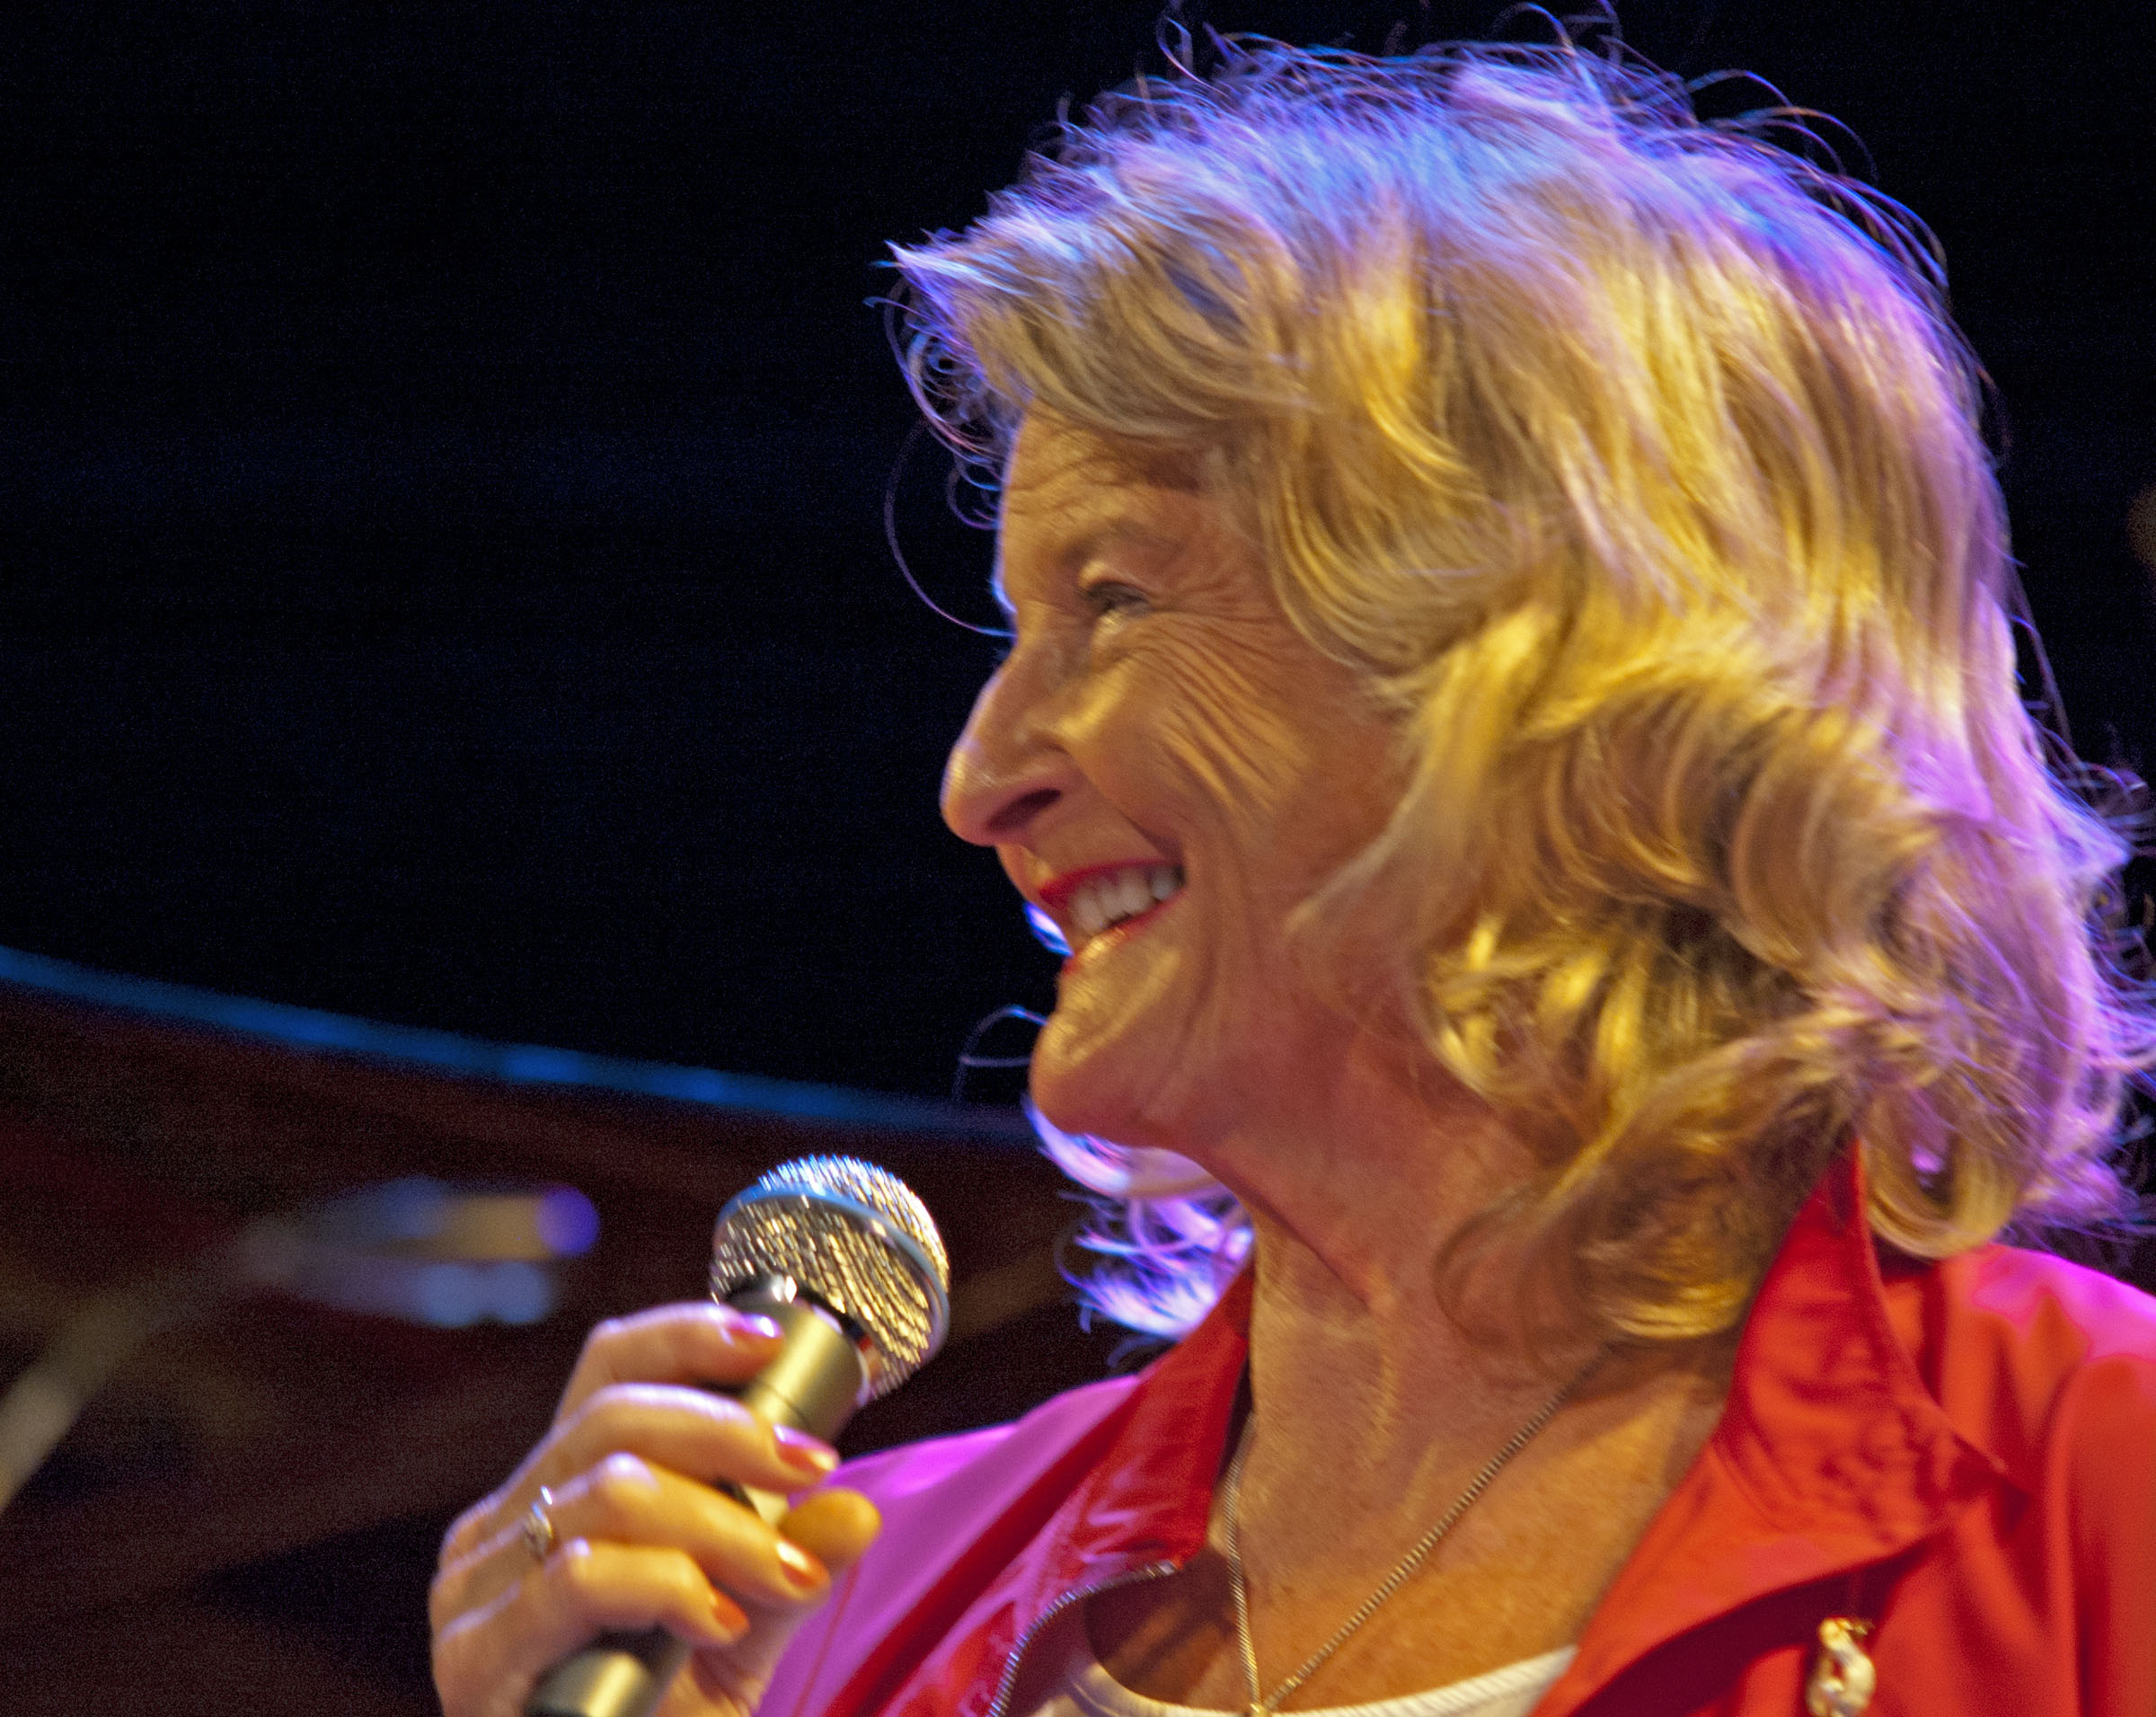 Karin Krog/Bengt Hallberg, 2011 Oslo Jazz Festival